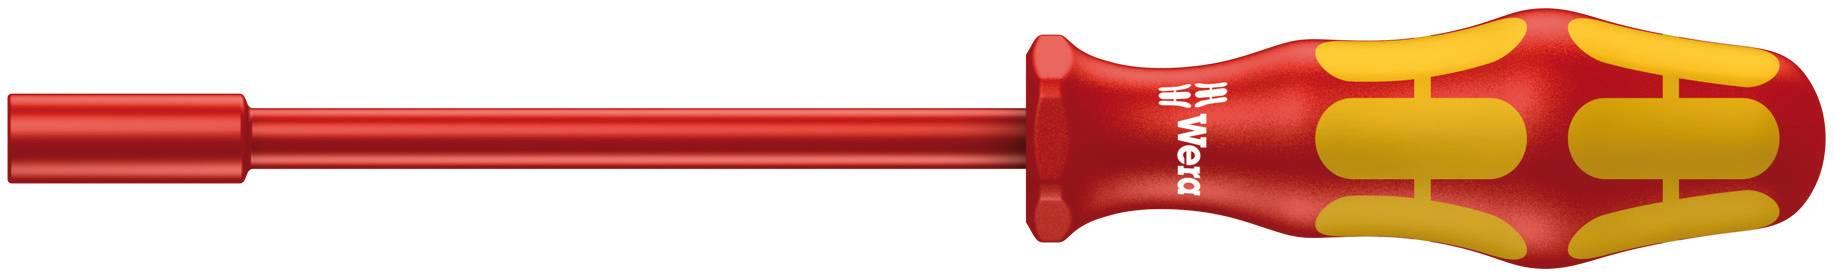 Šestihranný nástrčný klíč VDE Wera 190, 05005310001, délka 7 mm